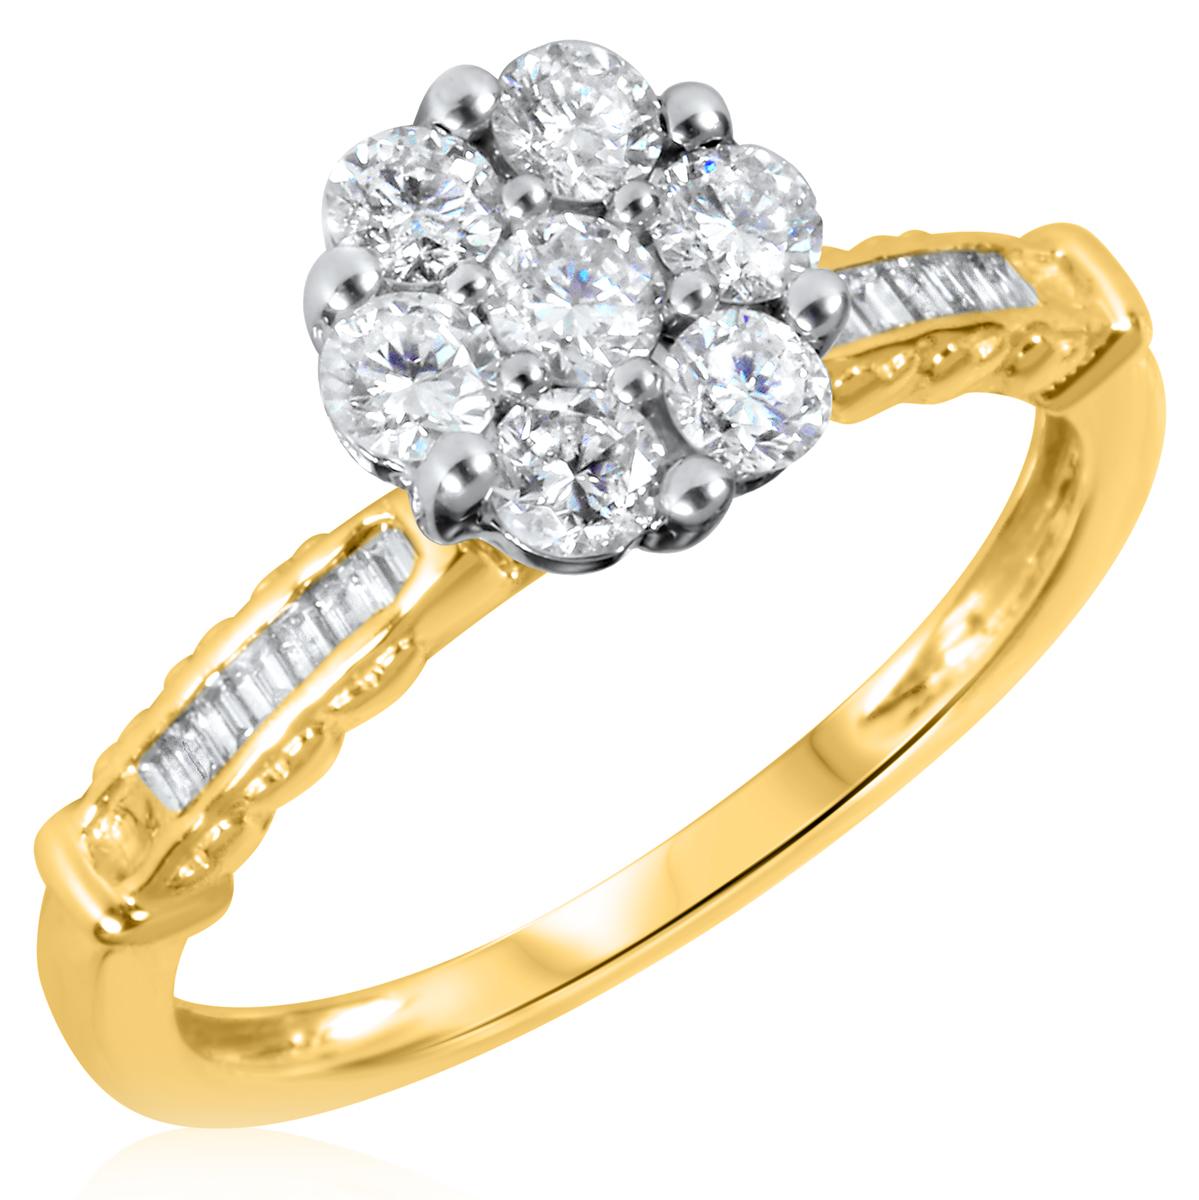 7/8 CT. T.W. Diamond Ladies Engagement Ring 10K Yellow Gold- Size 8